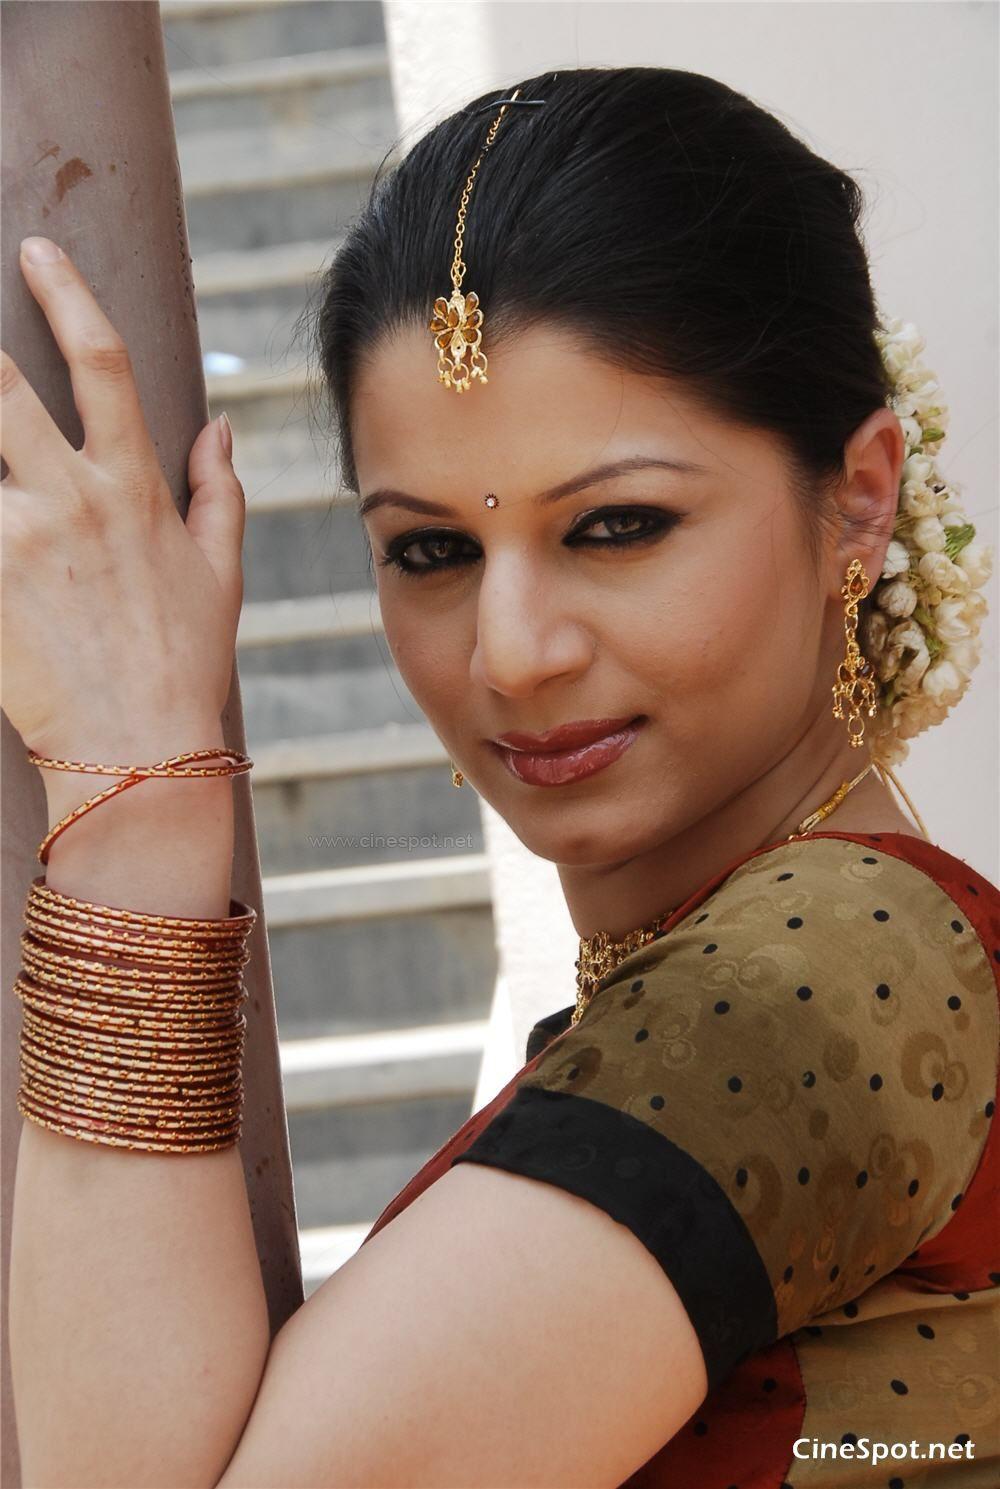 Wallpaper world south indian actress wallpaper photos - South indian actress wallpaper ...